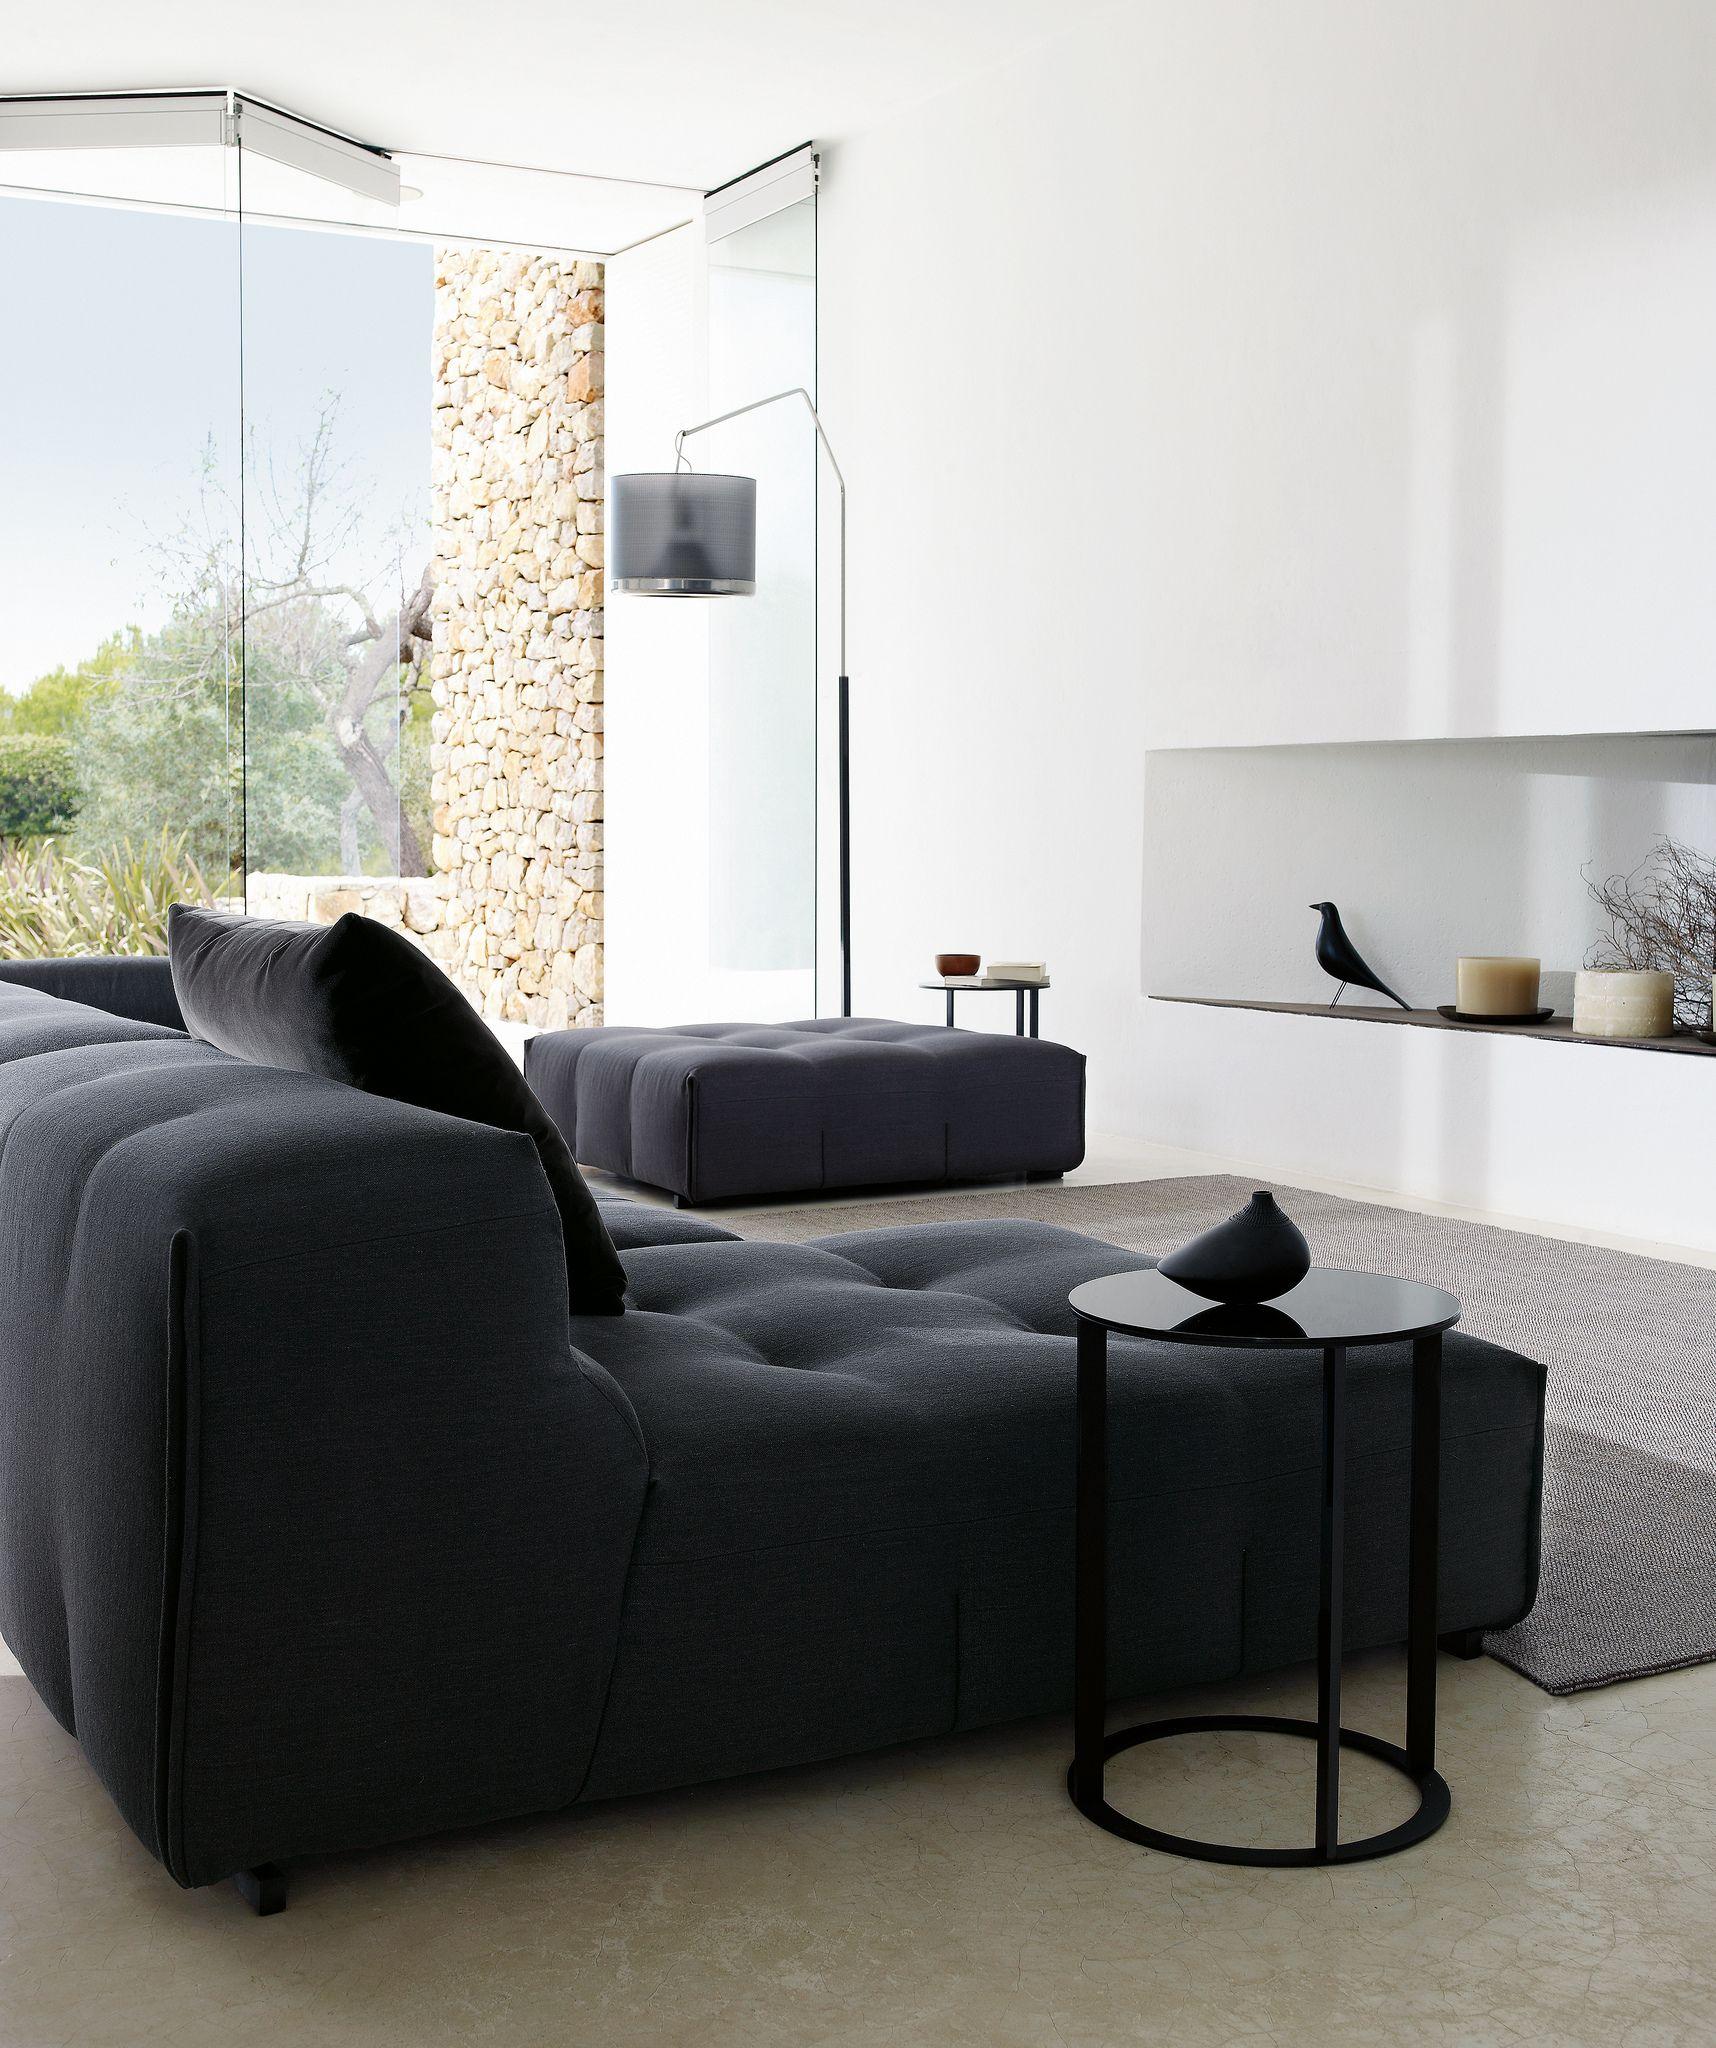 Bub italia home tuftytoo italia living rooms and interiors